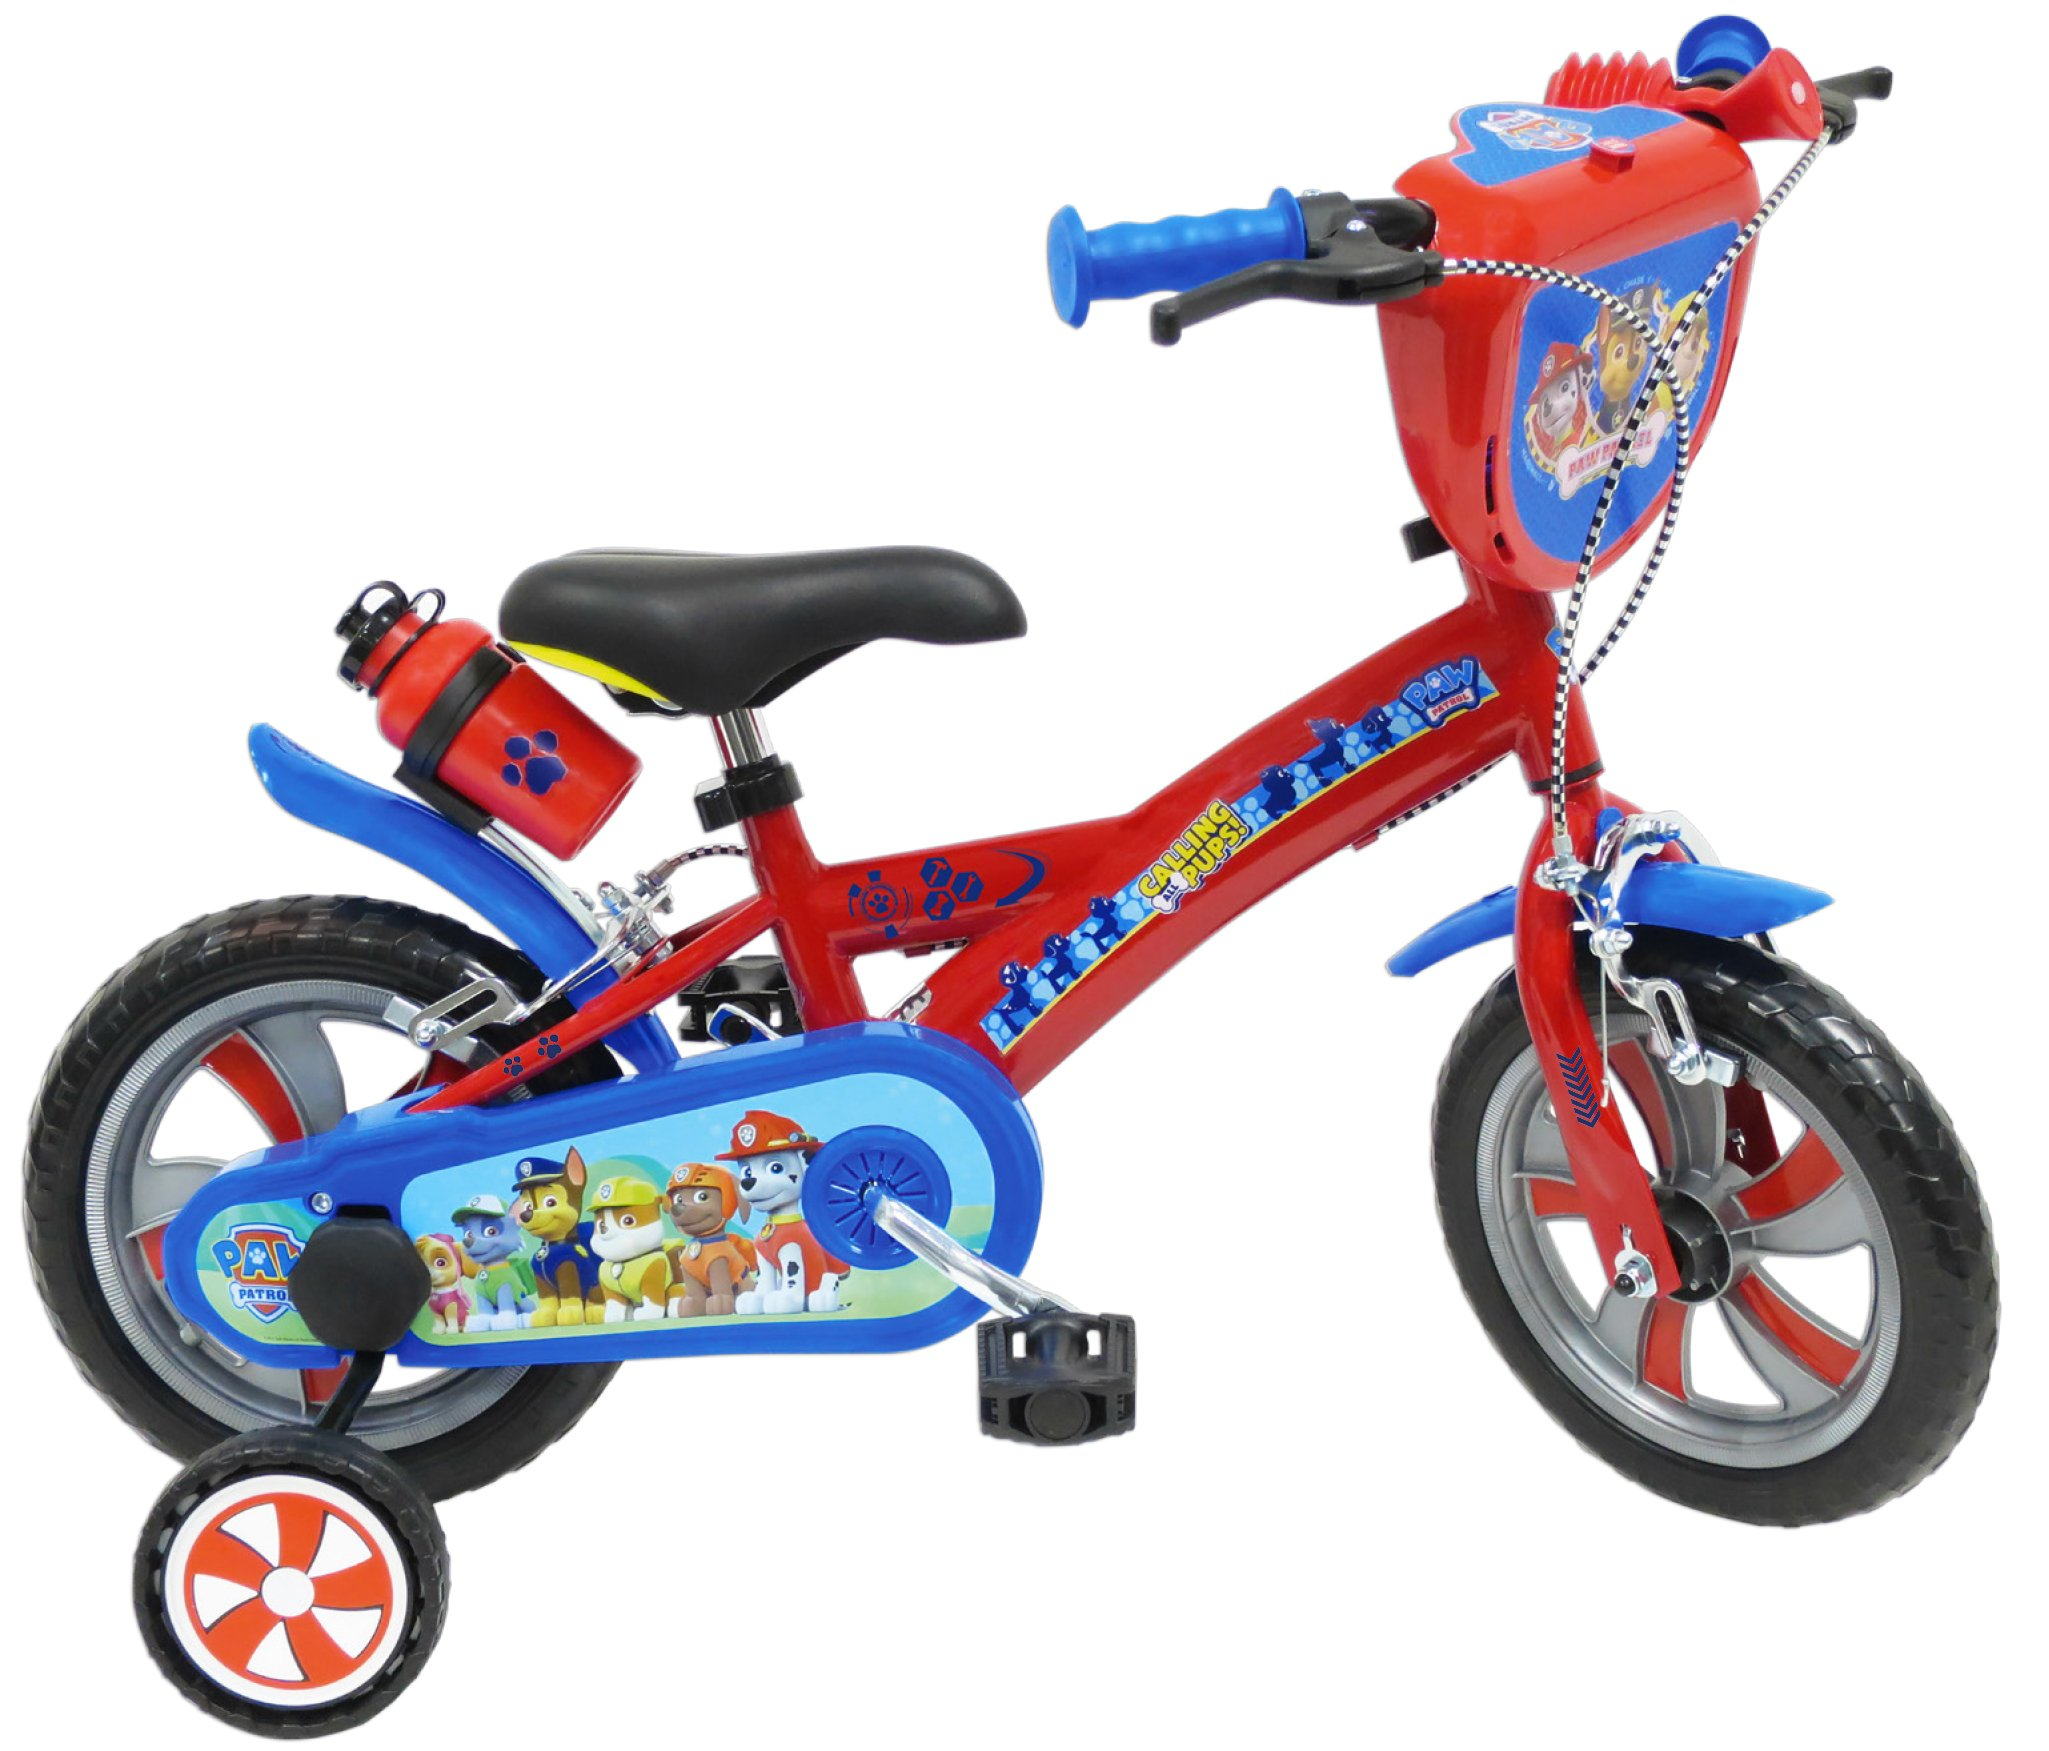 PAW PATROL Fahrrad für Kinder, Kinder, Pat' Patrouille, blau, 12